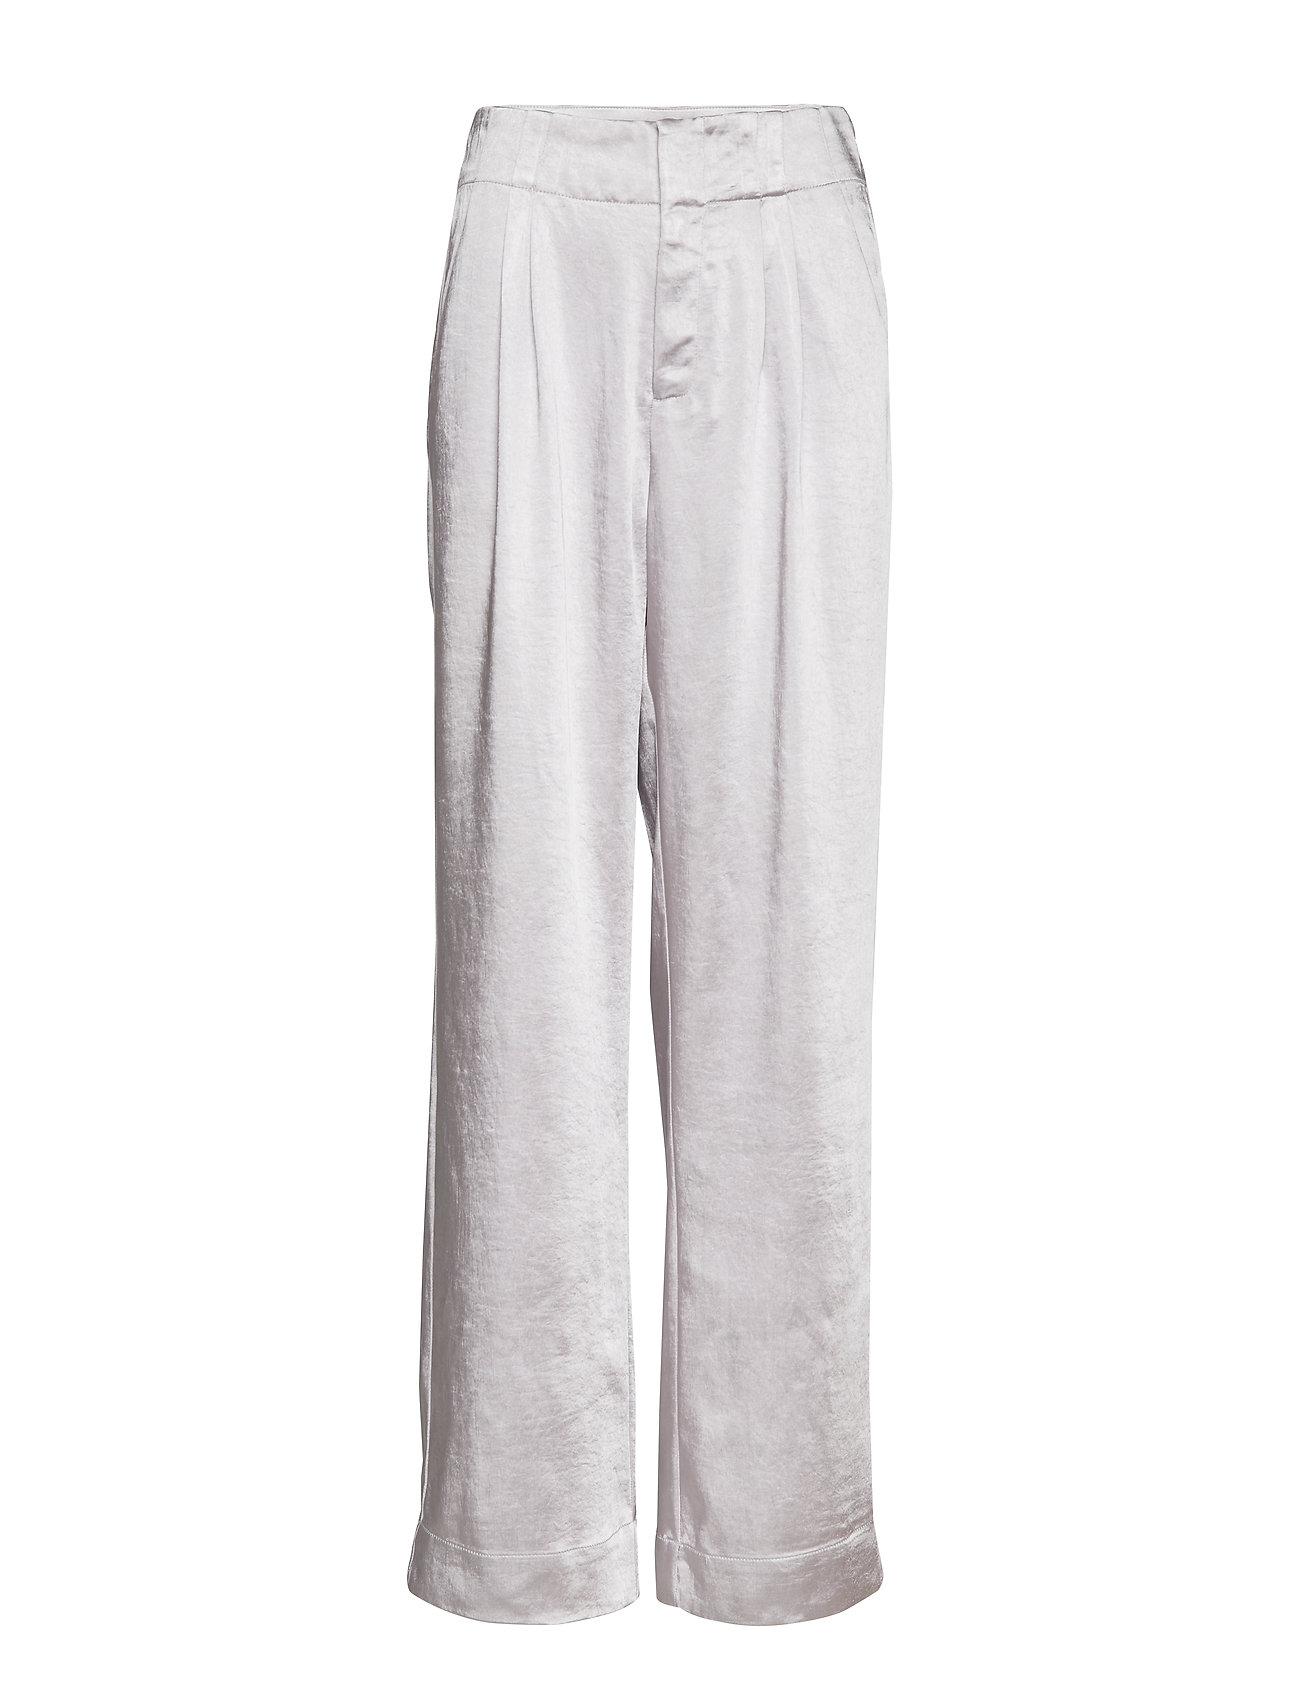 Ms19purpleGestuz Pants Pants Fabi Ms19purpleGestuz Fabi Fabi Pants Ms19purpleGestuz 4ARjL35